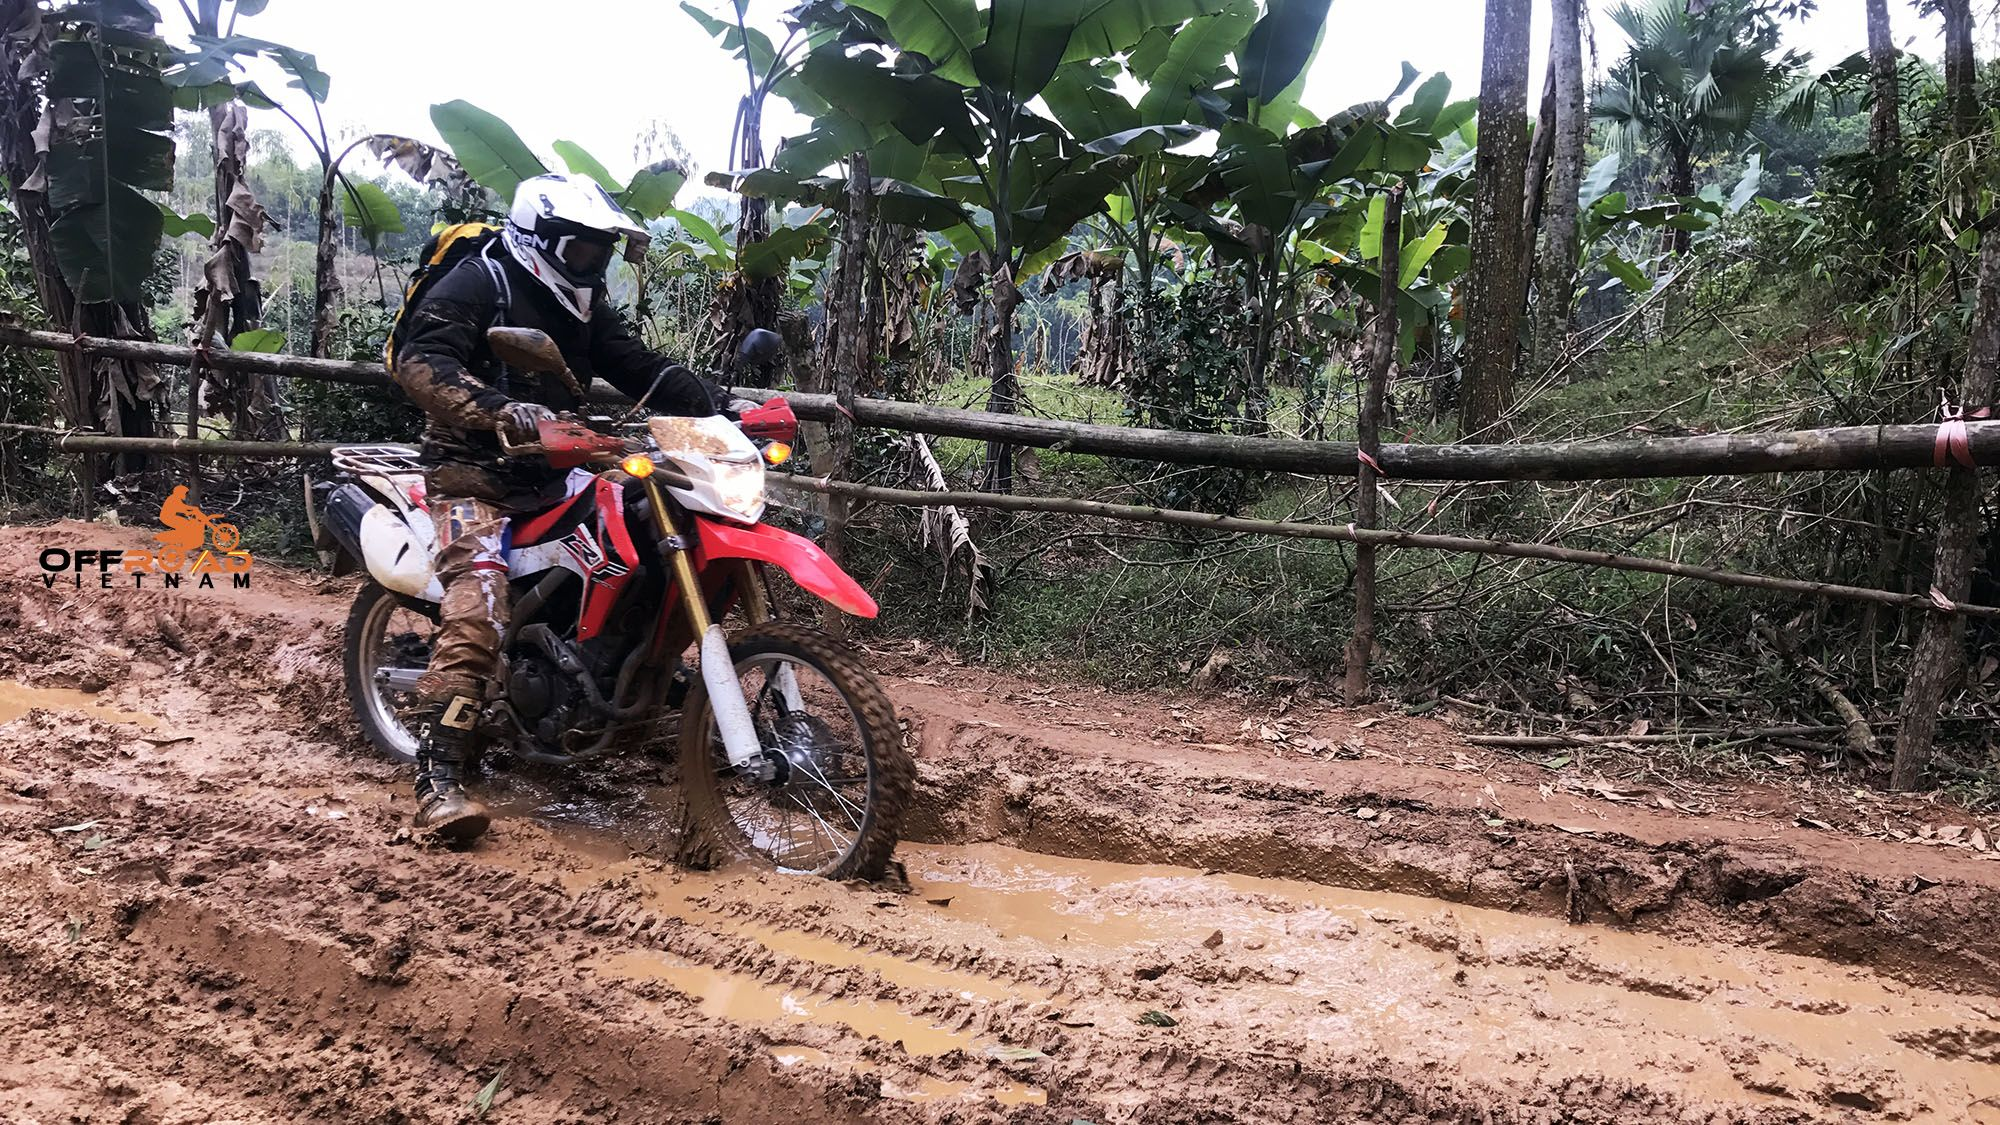 Pin On Photos Motorbike Tours Of Vietnam